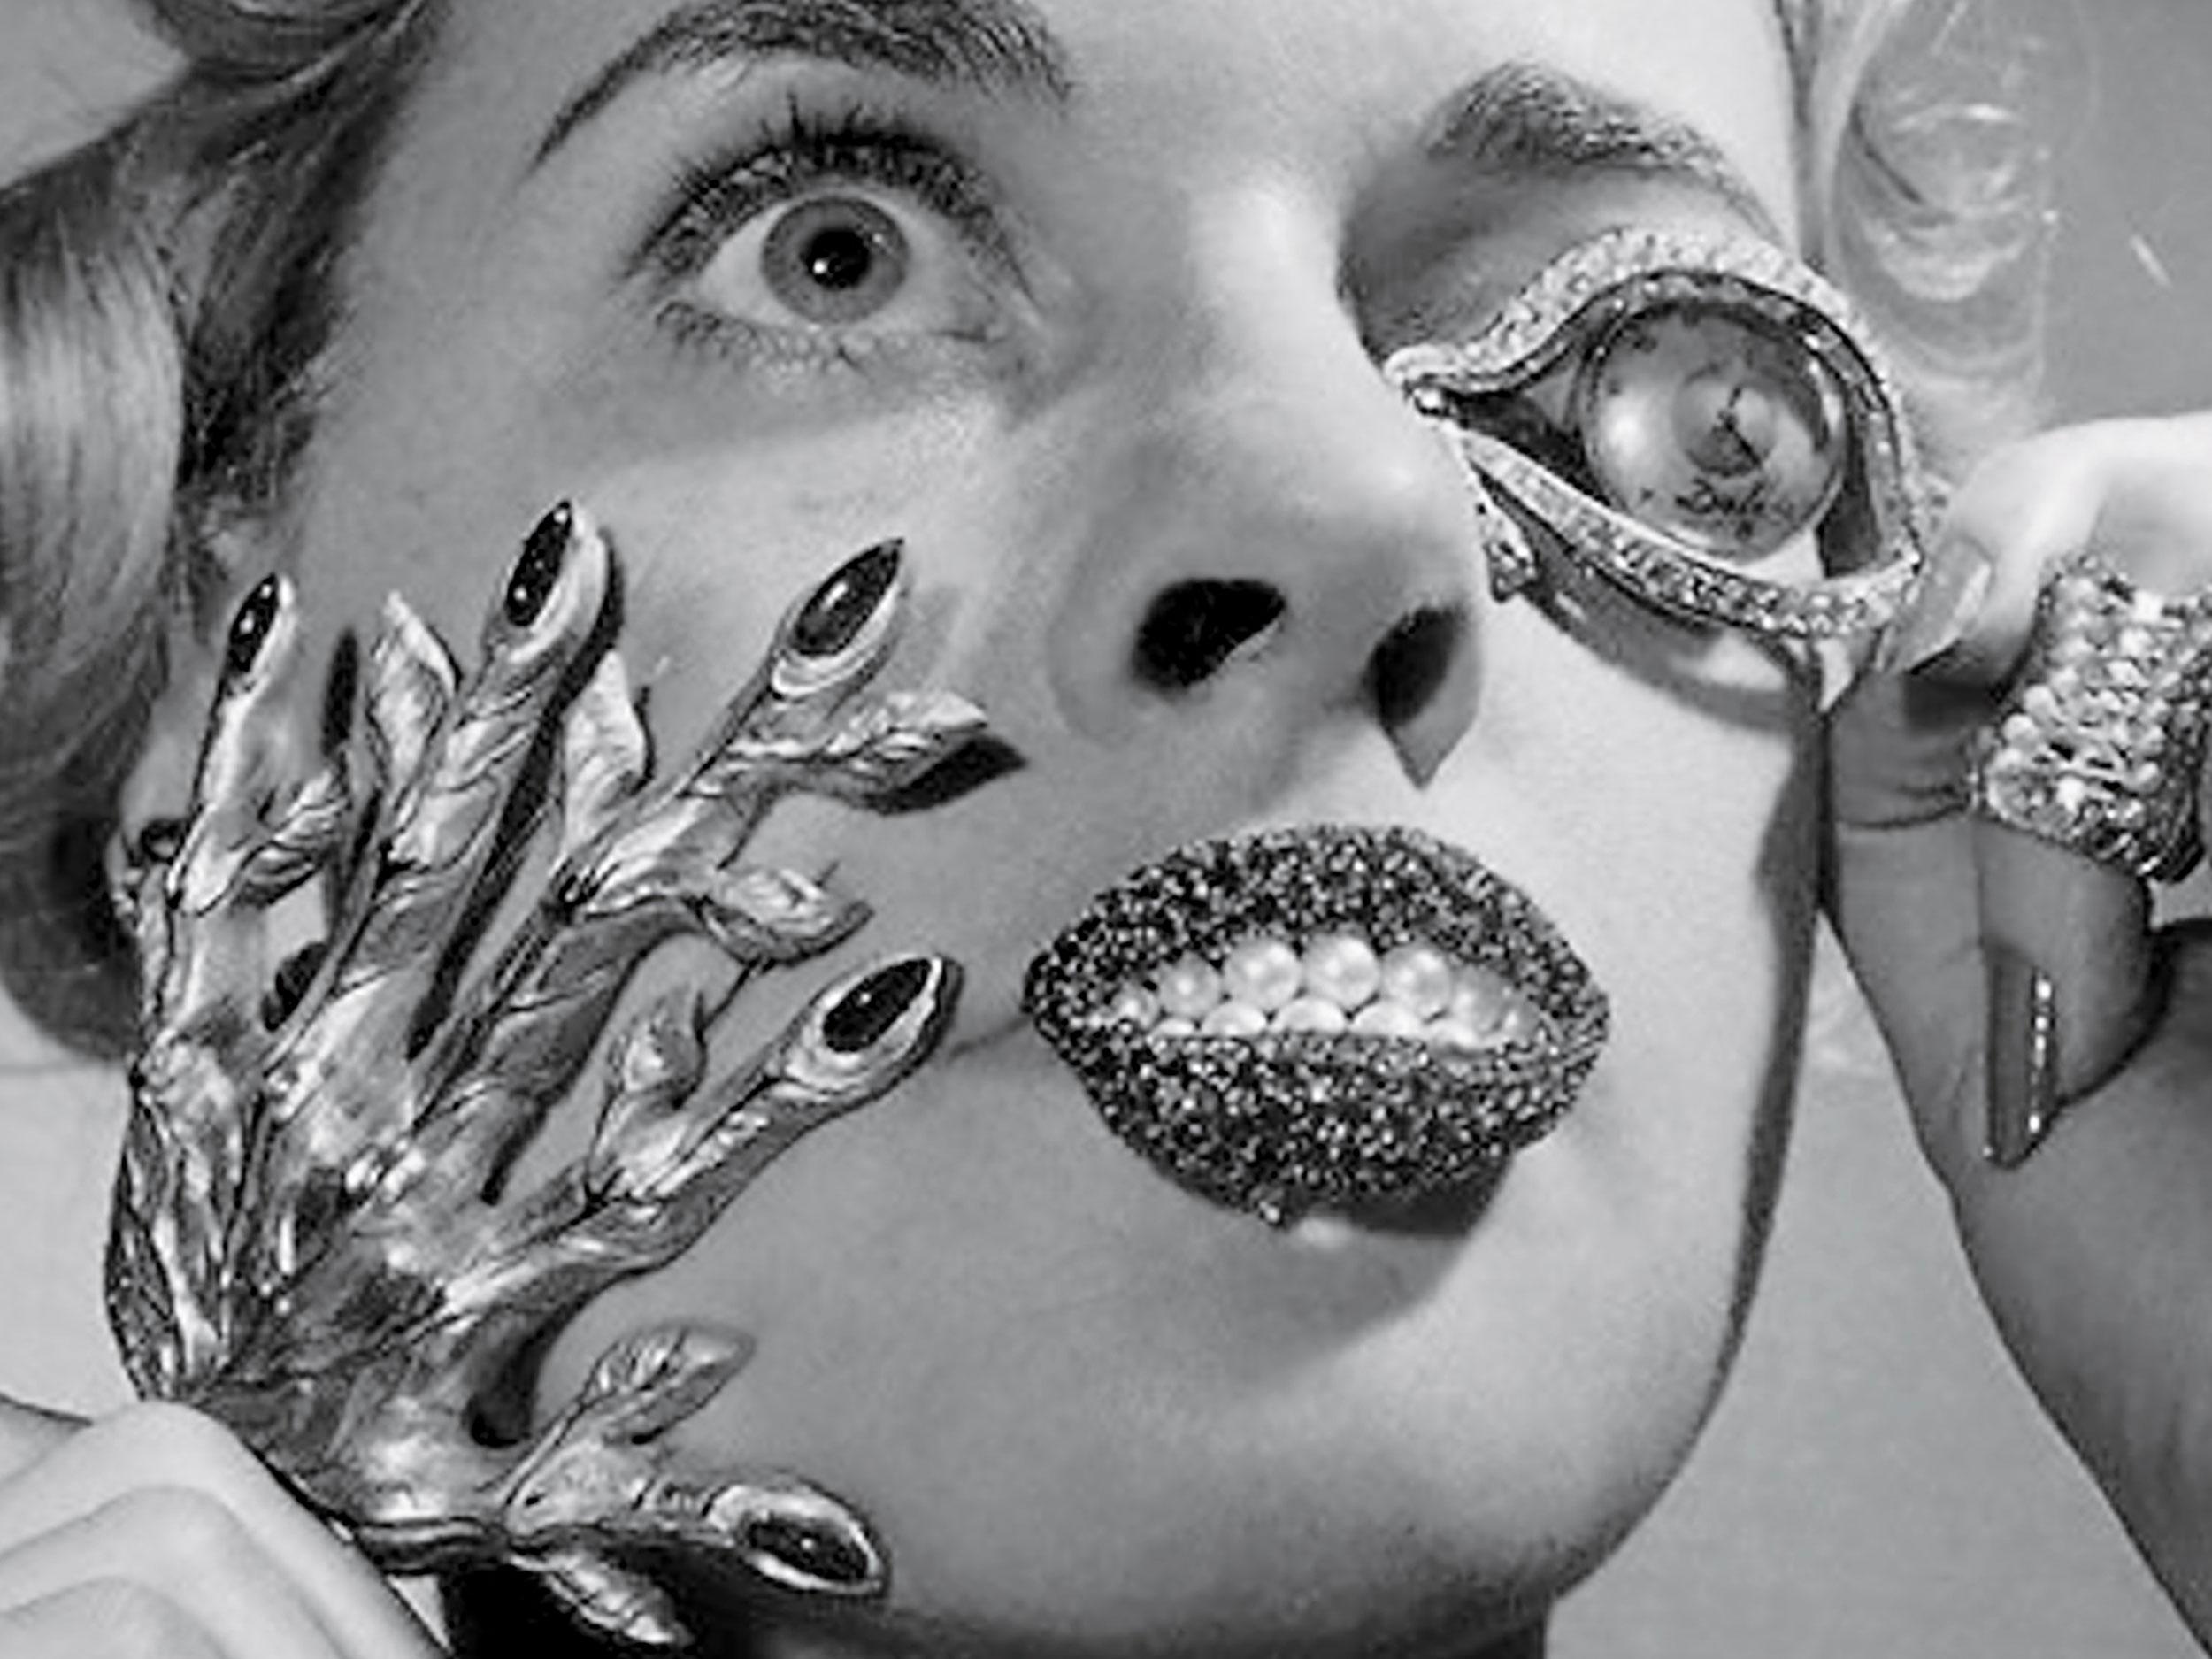 Delfina Delettrez, daughter of Silvia Venturini Fendi, shares her jewelry design inspirations